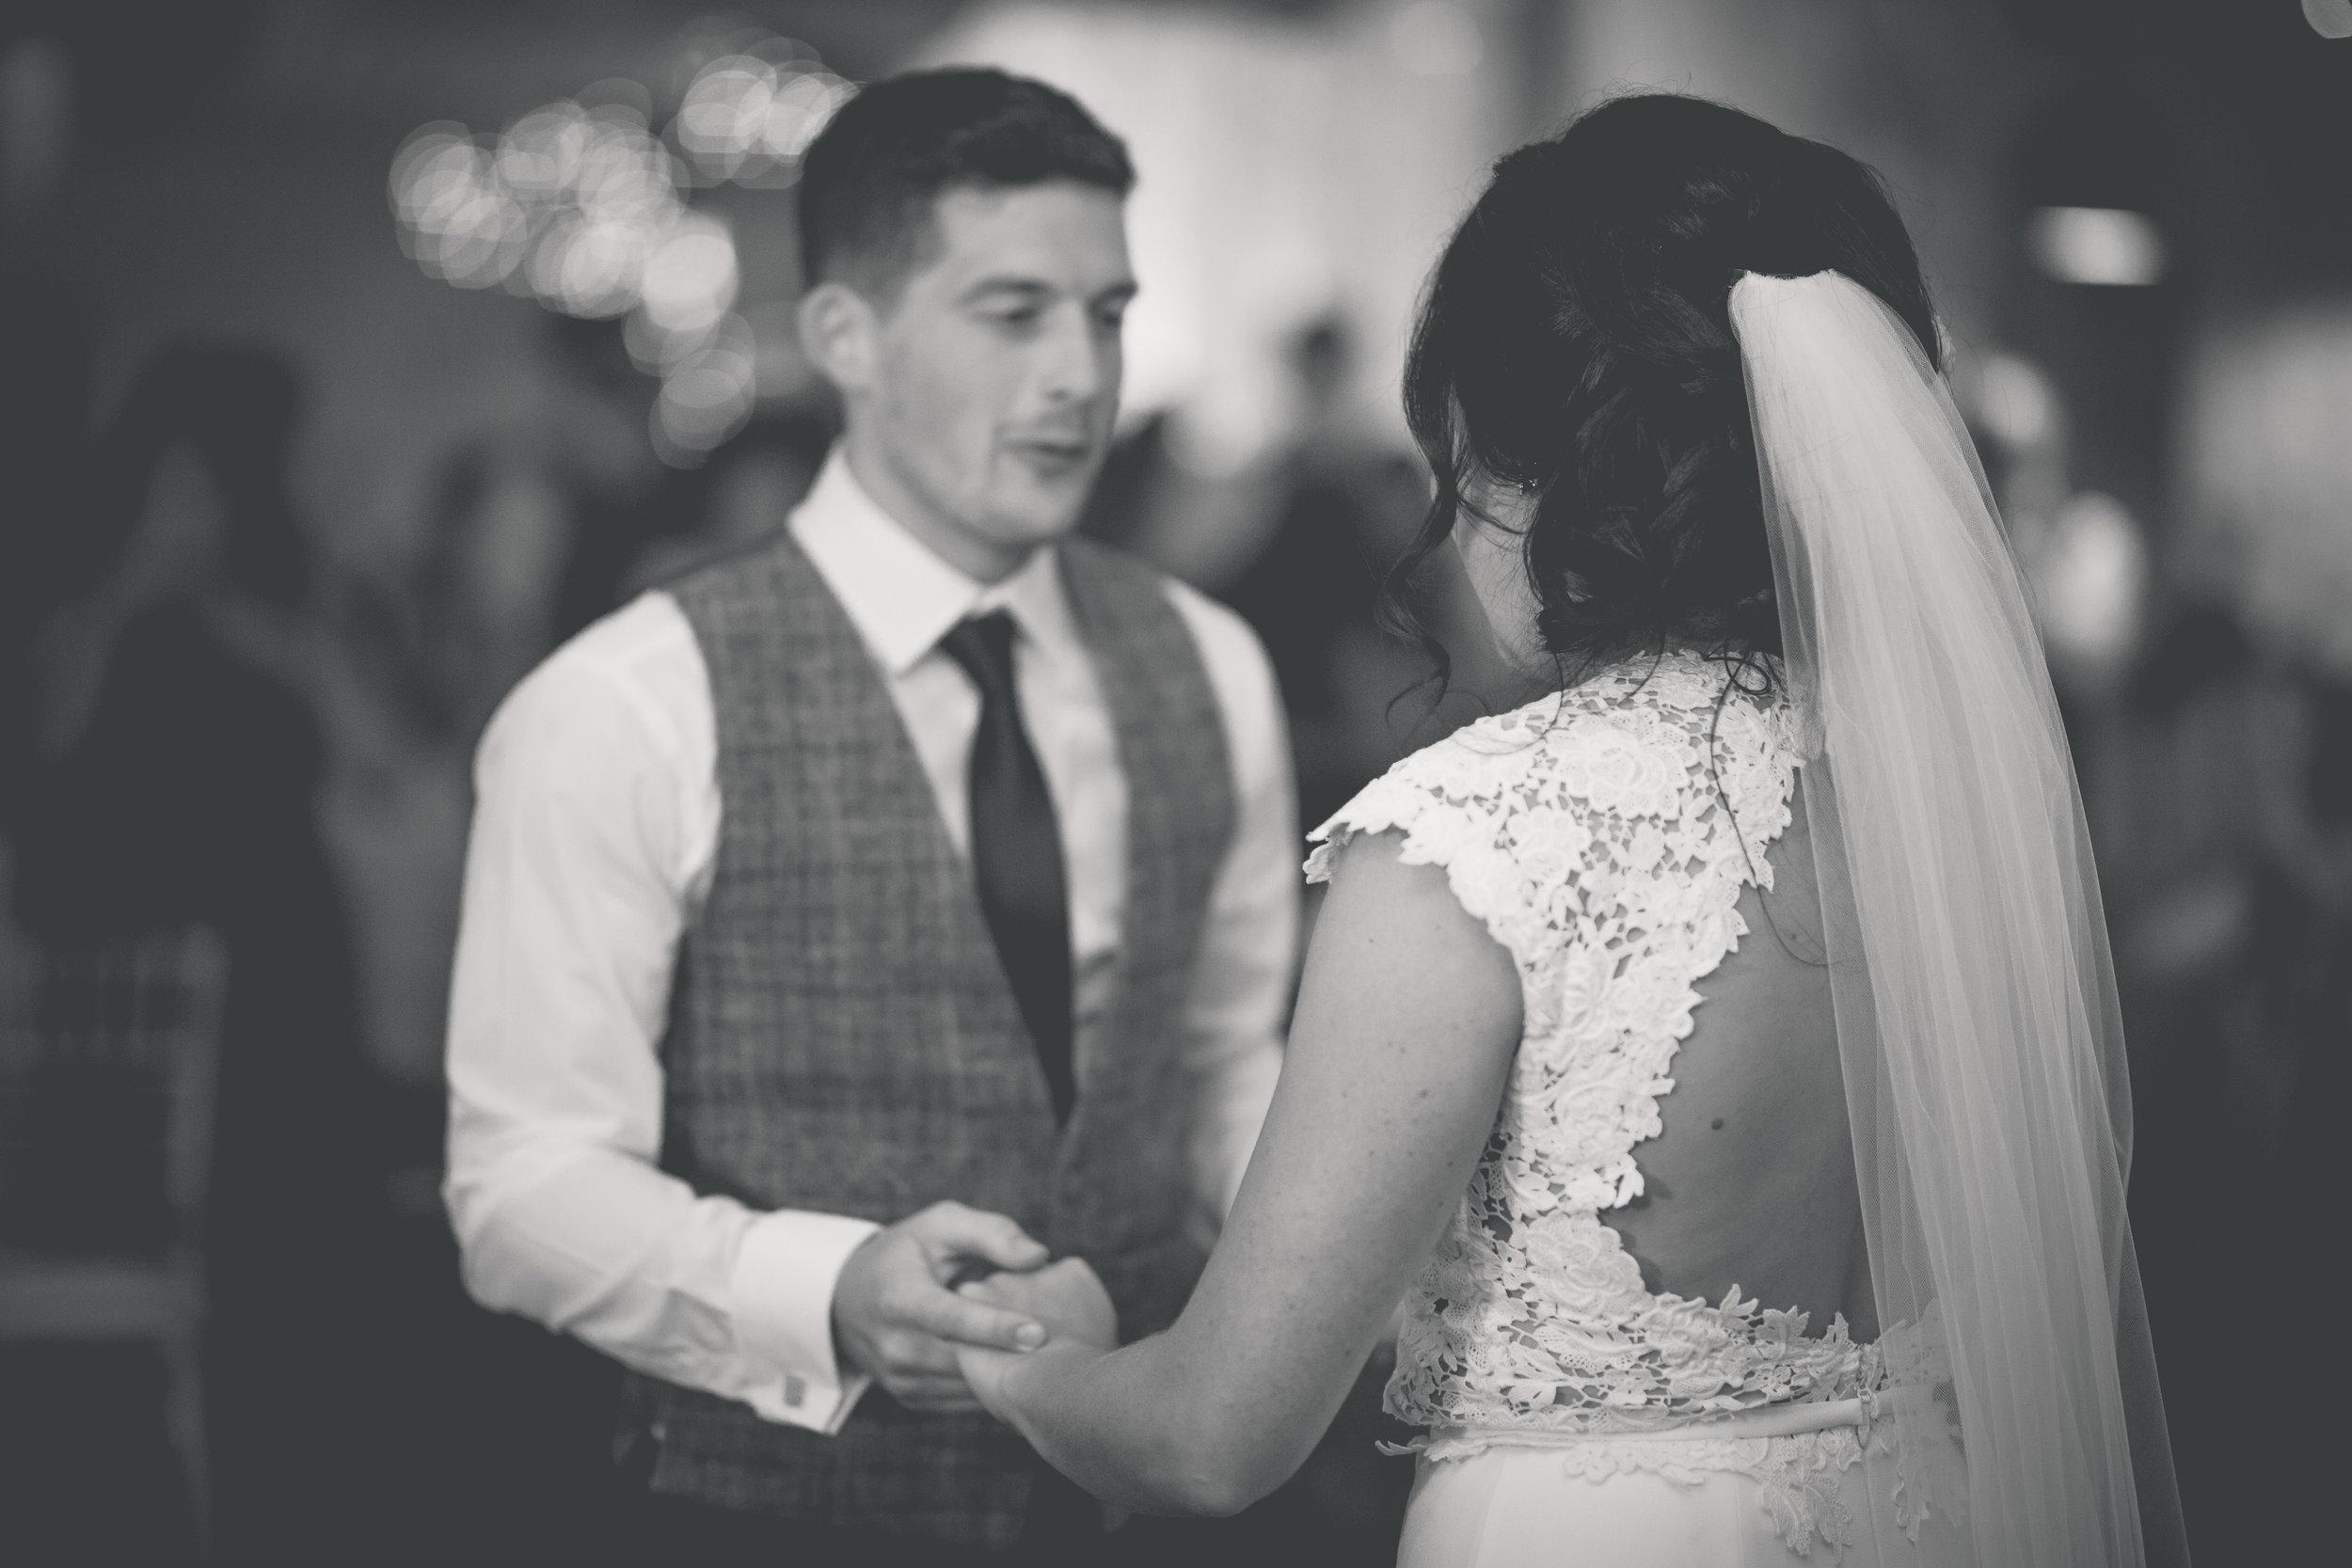 Brian McEwan Wedding Photography | Carol-Annee & Sean | The Dancing-23.jpg